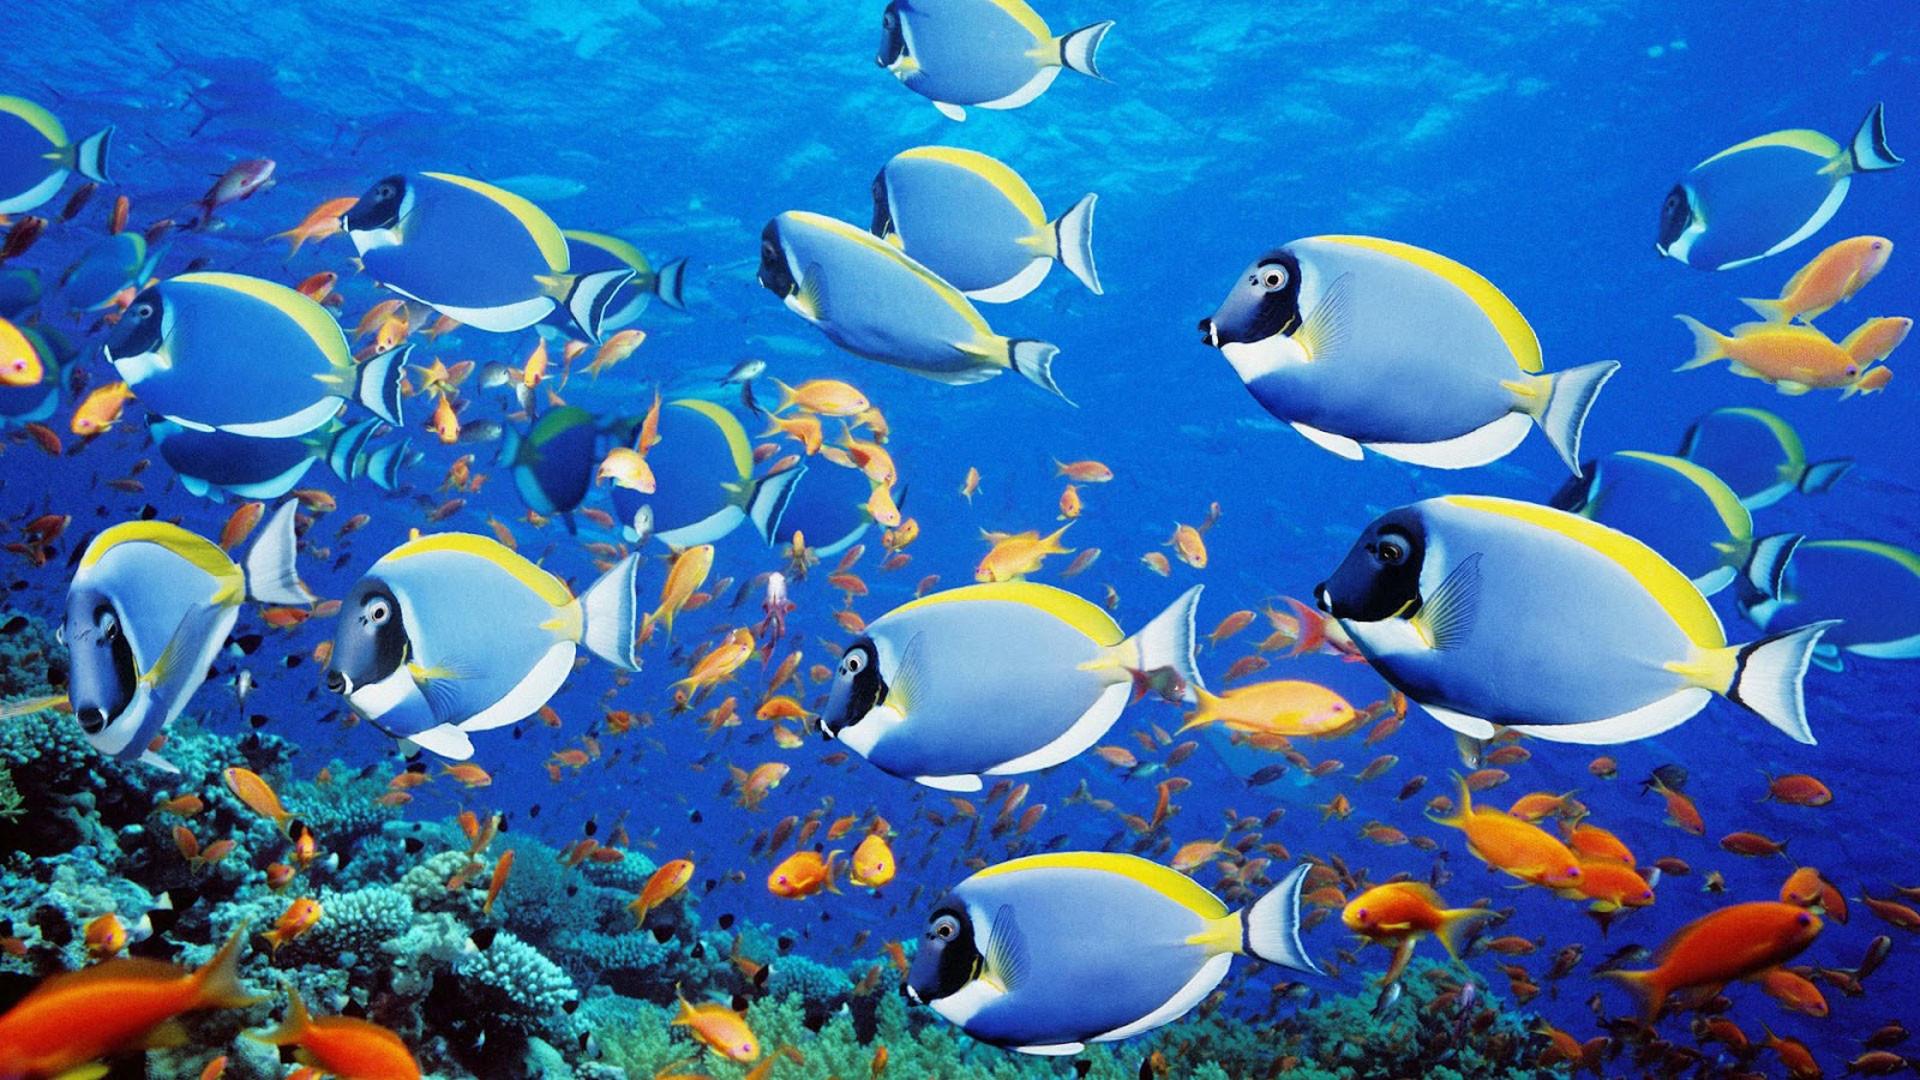 Res: 1920x1080, Ocean Fish Desktop Wallpapers